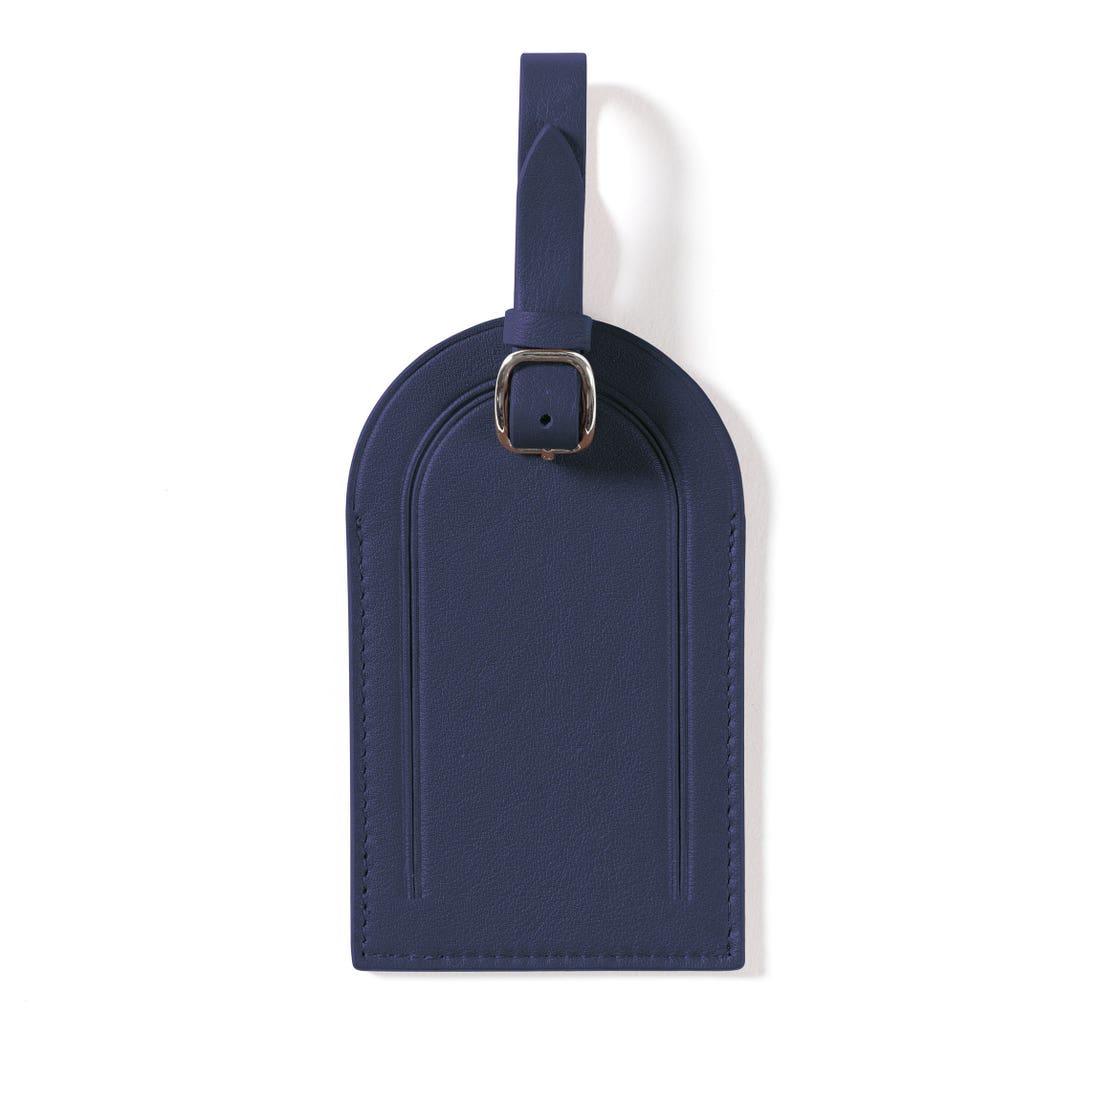 Privacy Luggage ID Tag